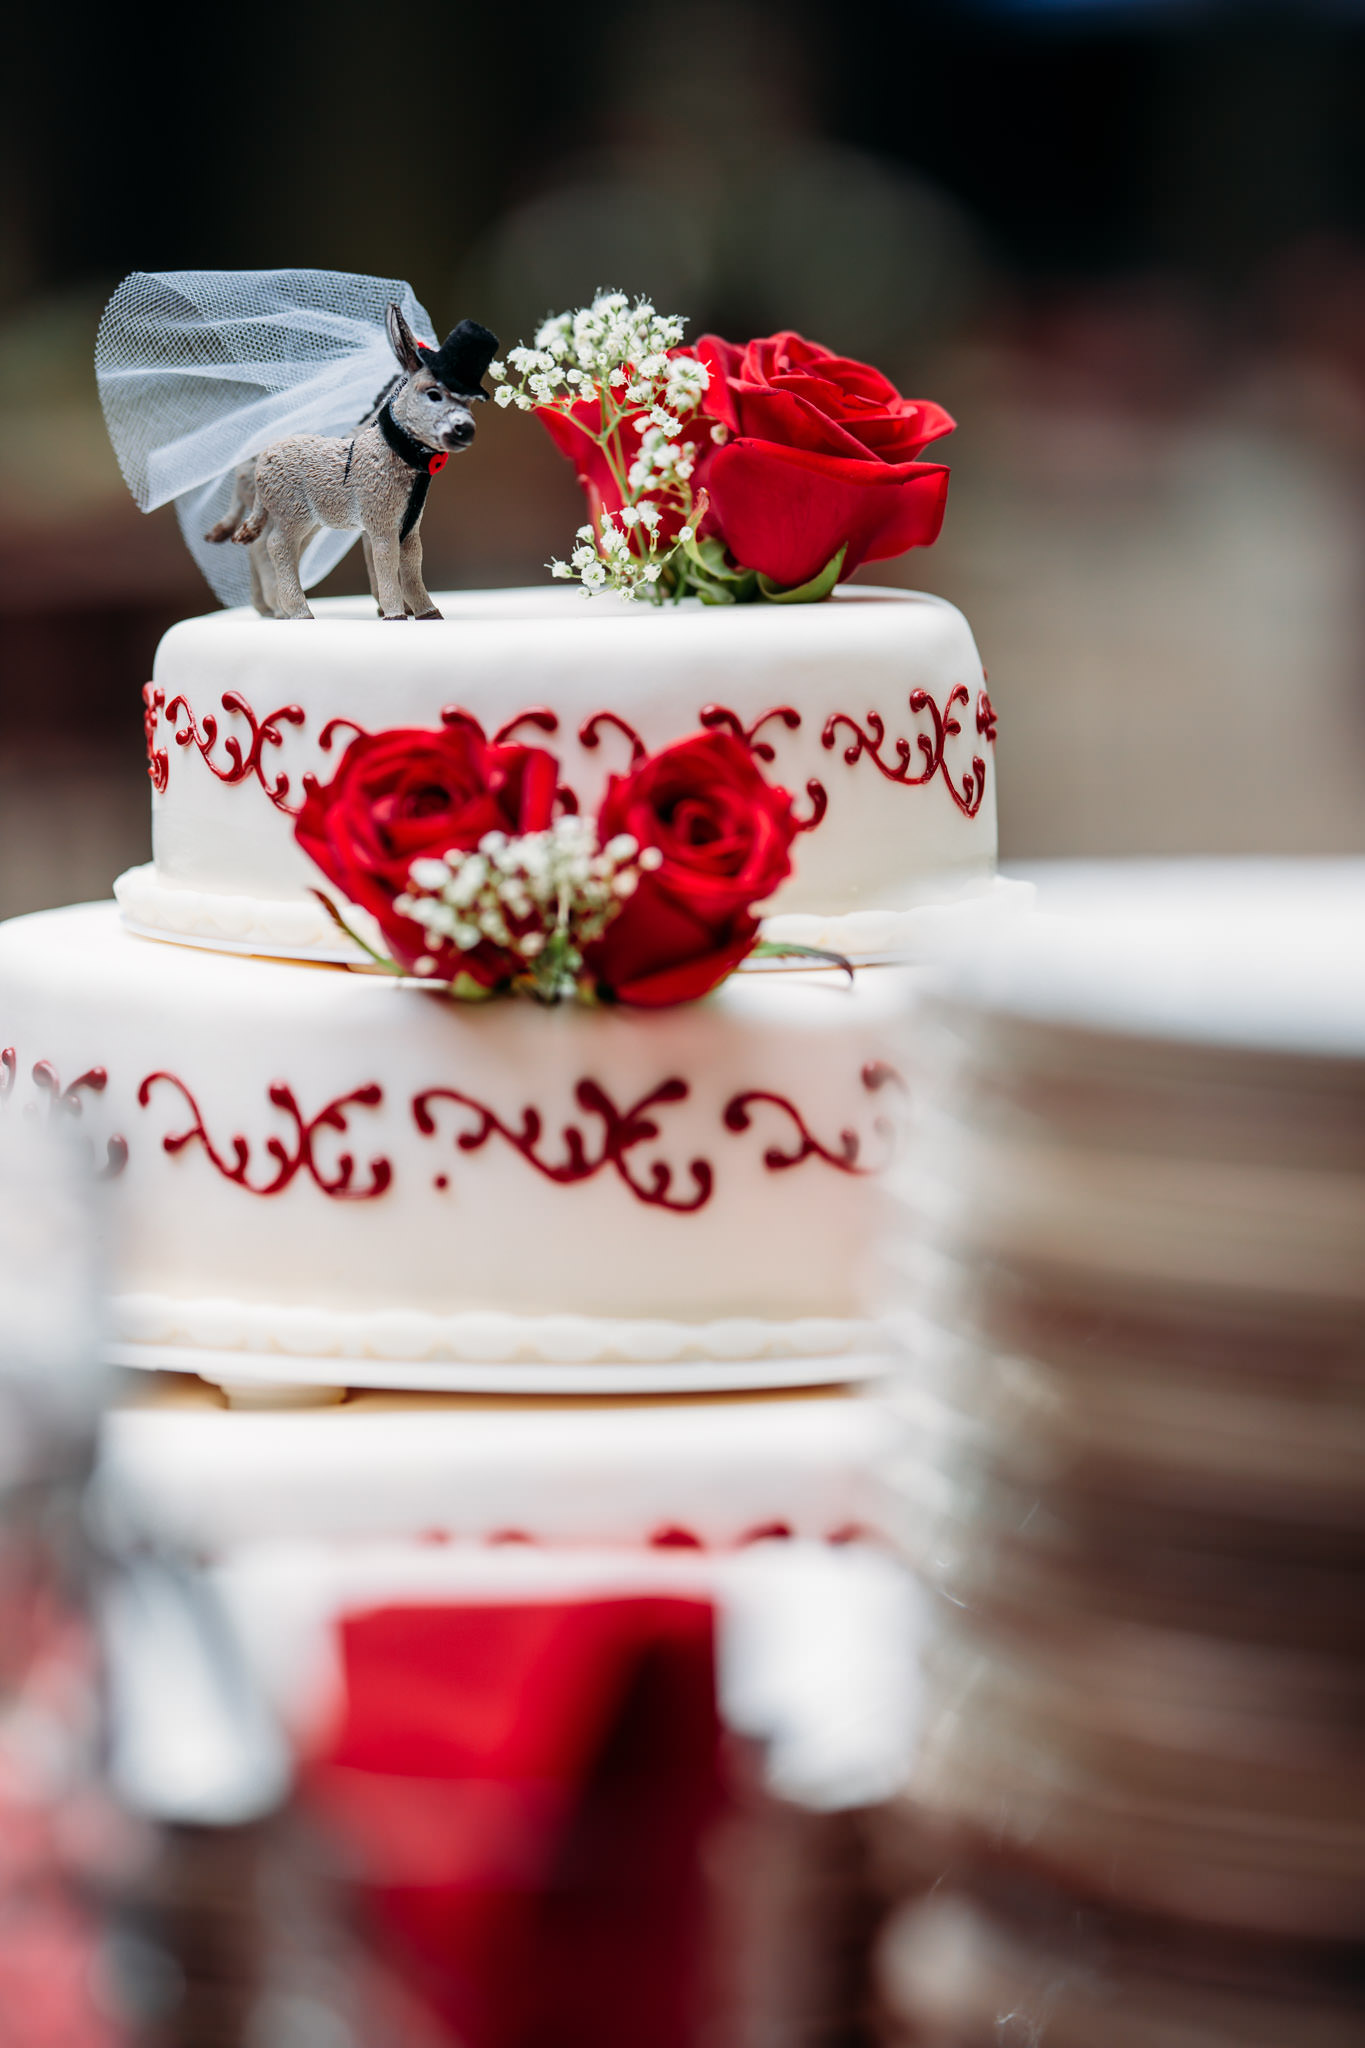 180825_Hochzeit_Berlin_Wannsee_Almhuette_Loretta_web_0016.jpg